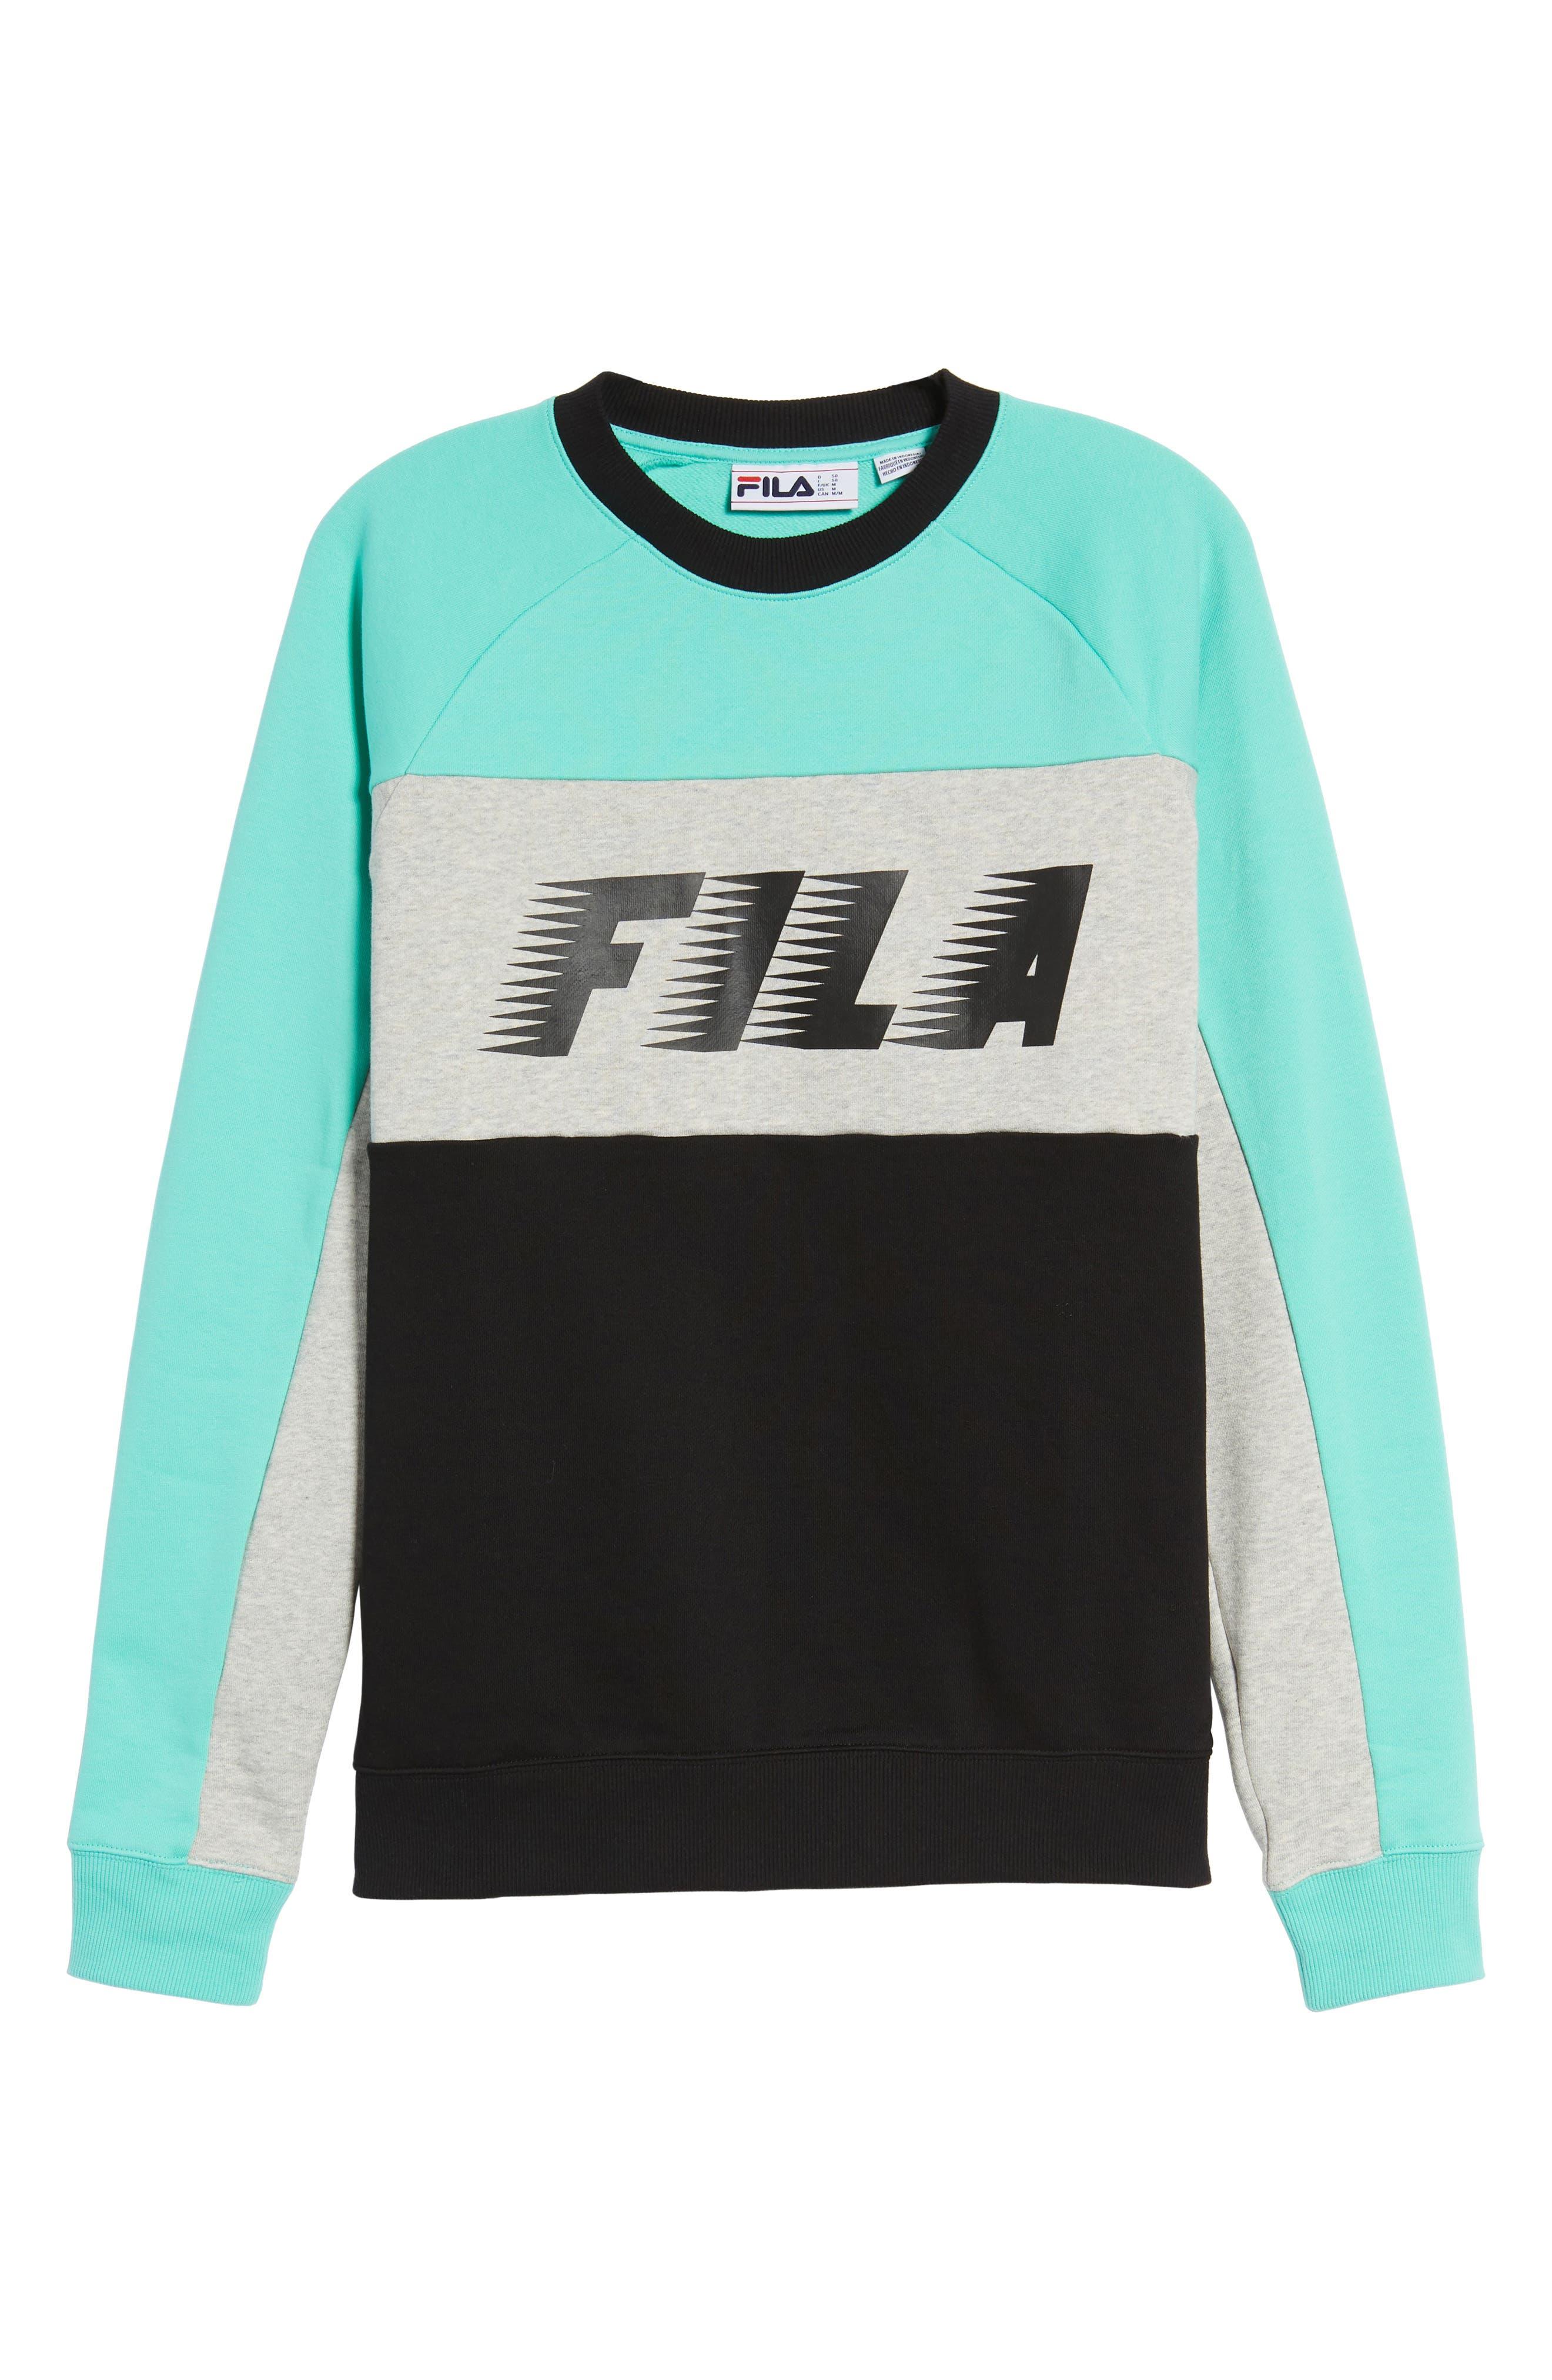 Layton Sweatshirt,                             Alternate thumbnail 6, color,                             Black/ Cockatoo/ Grey Marl